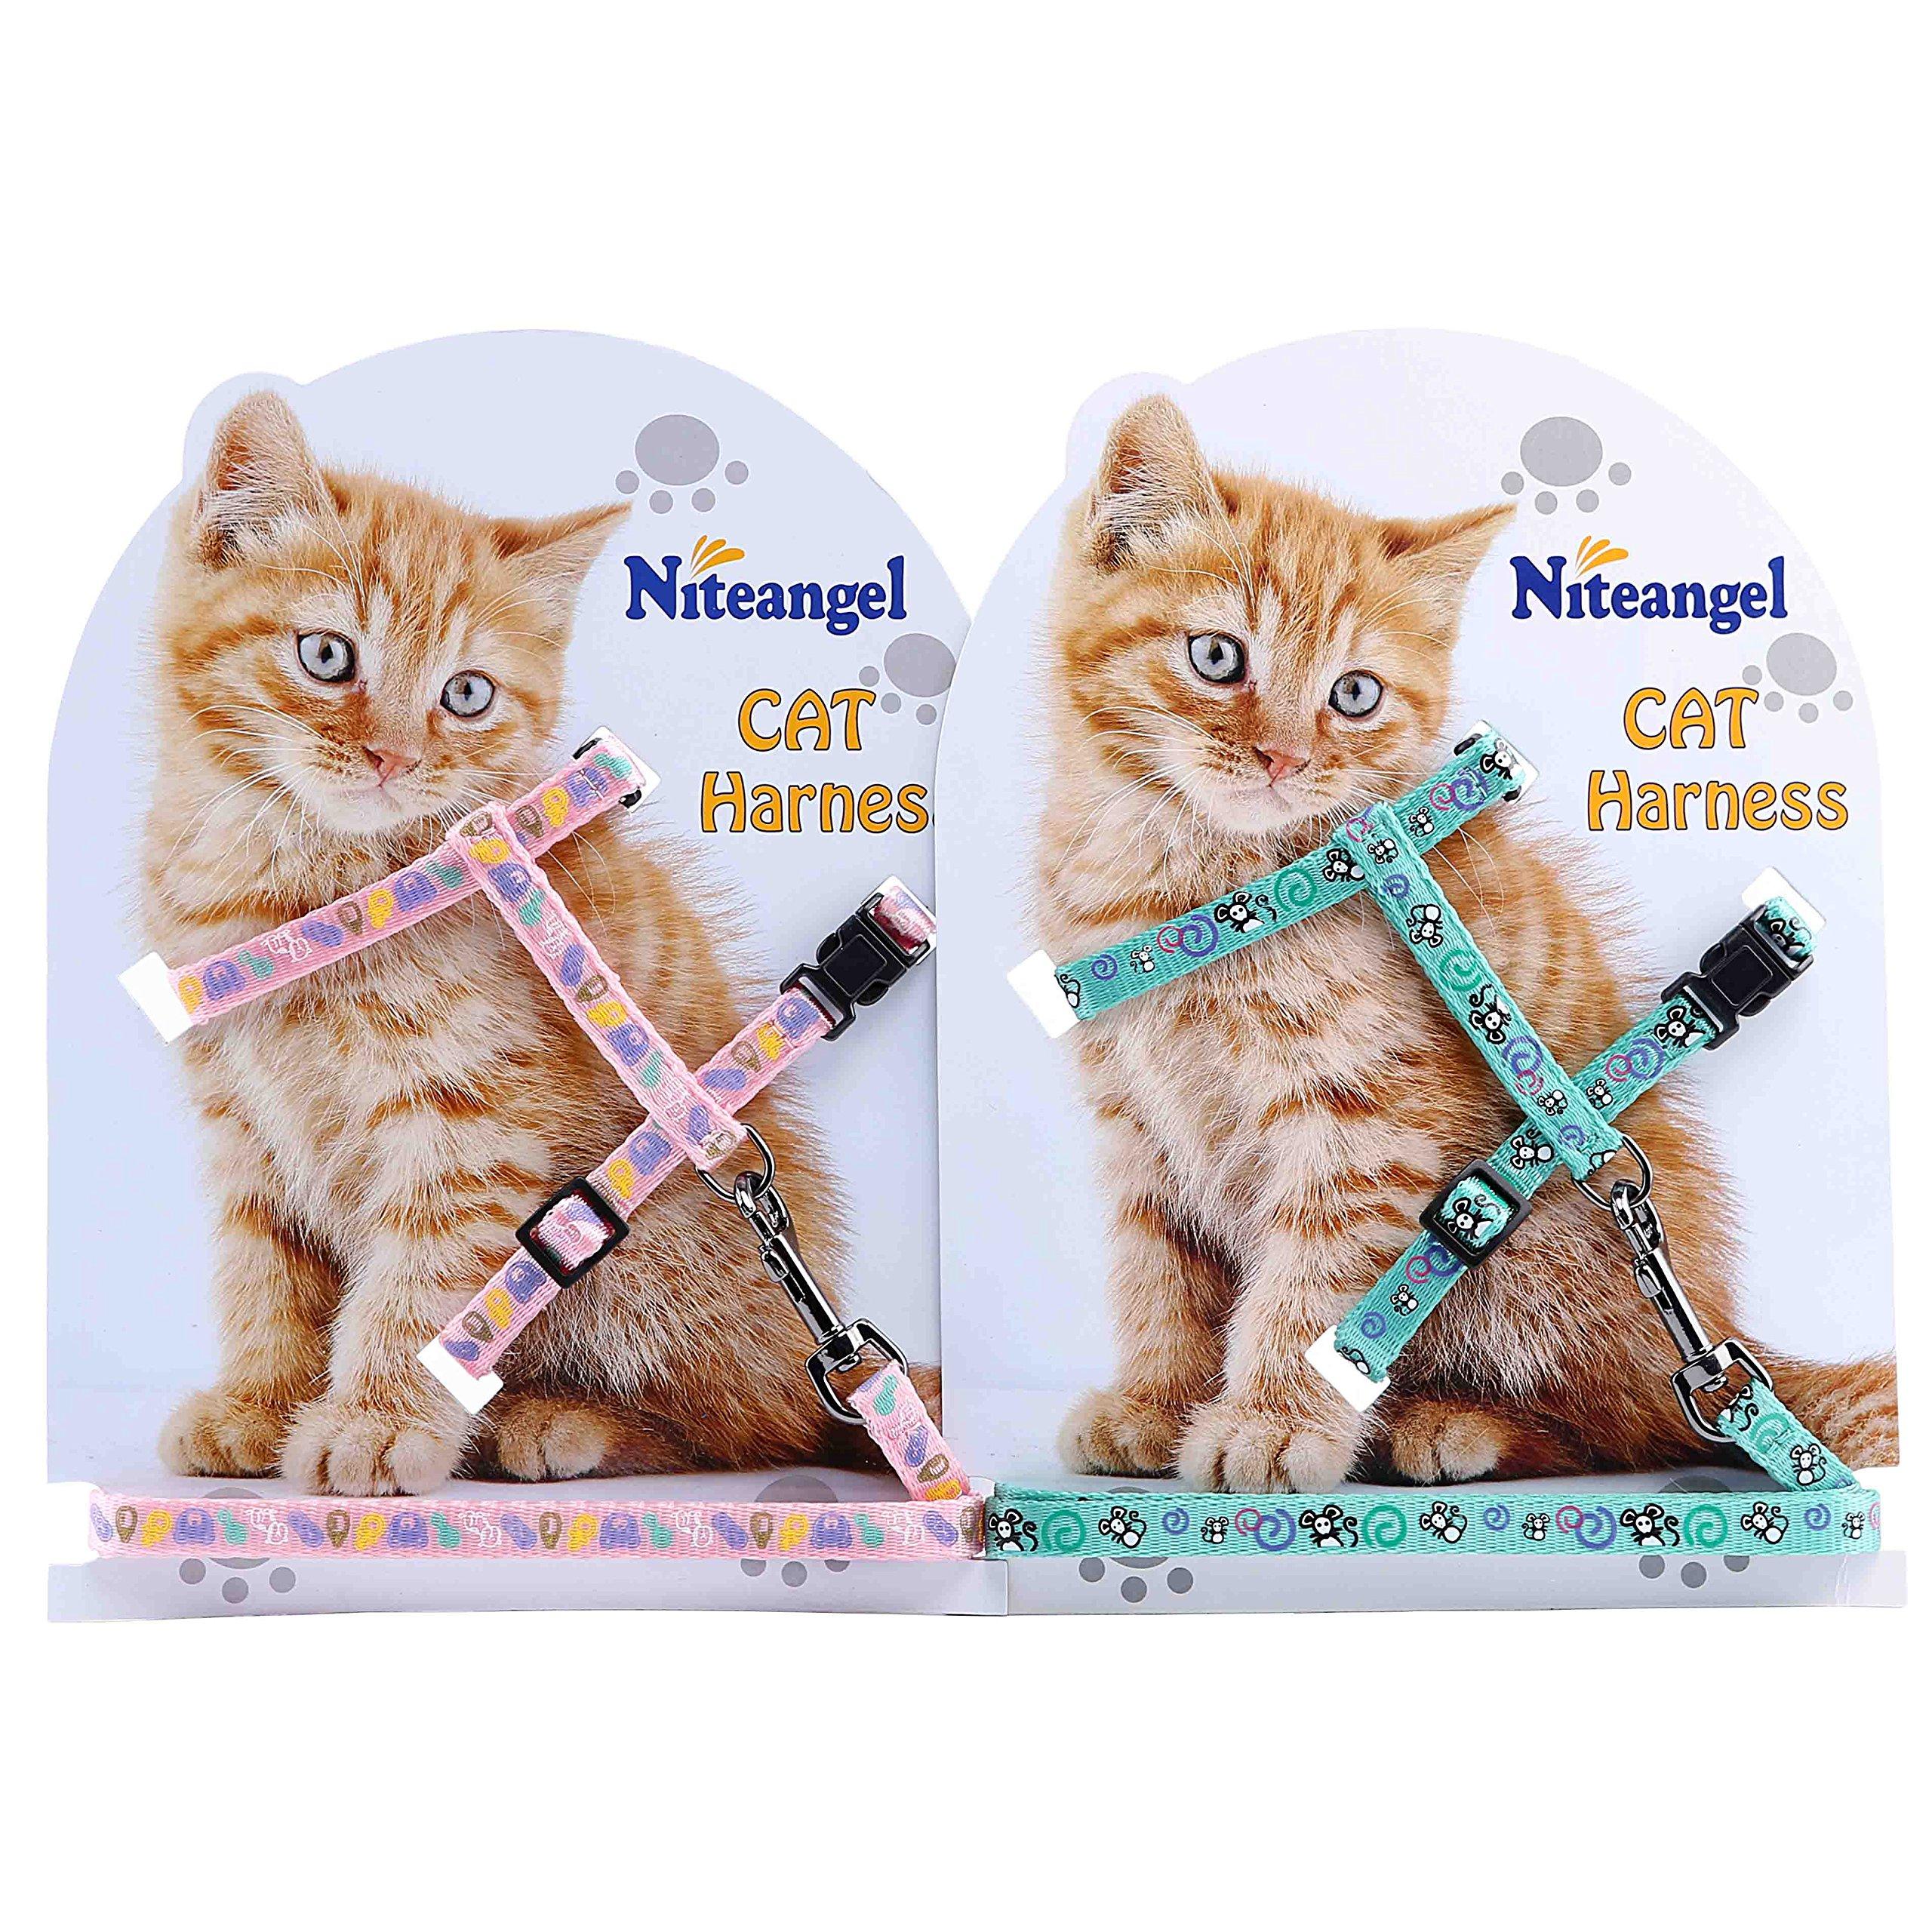 Niteangel 2-Pack of Adjustable Cat Harness & Leash (Pink & Green)